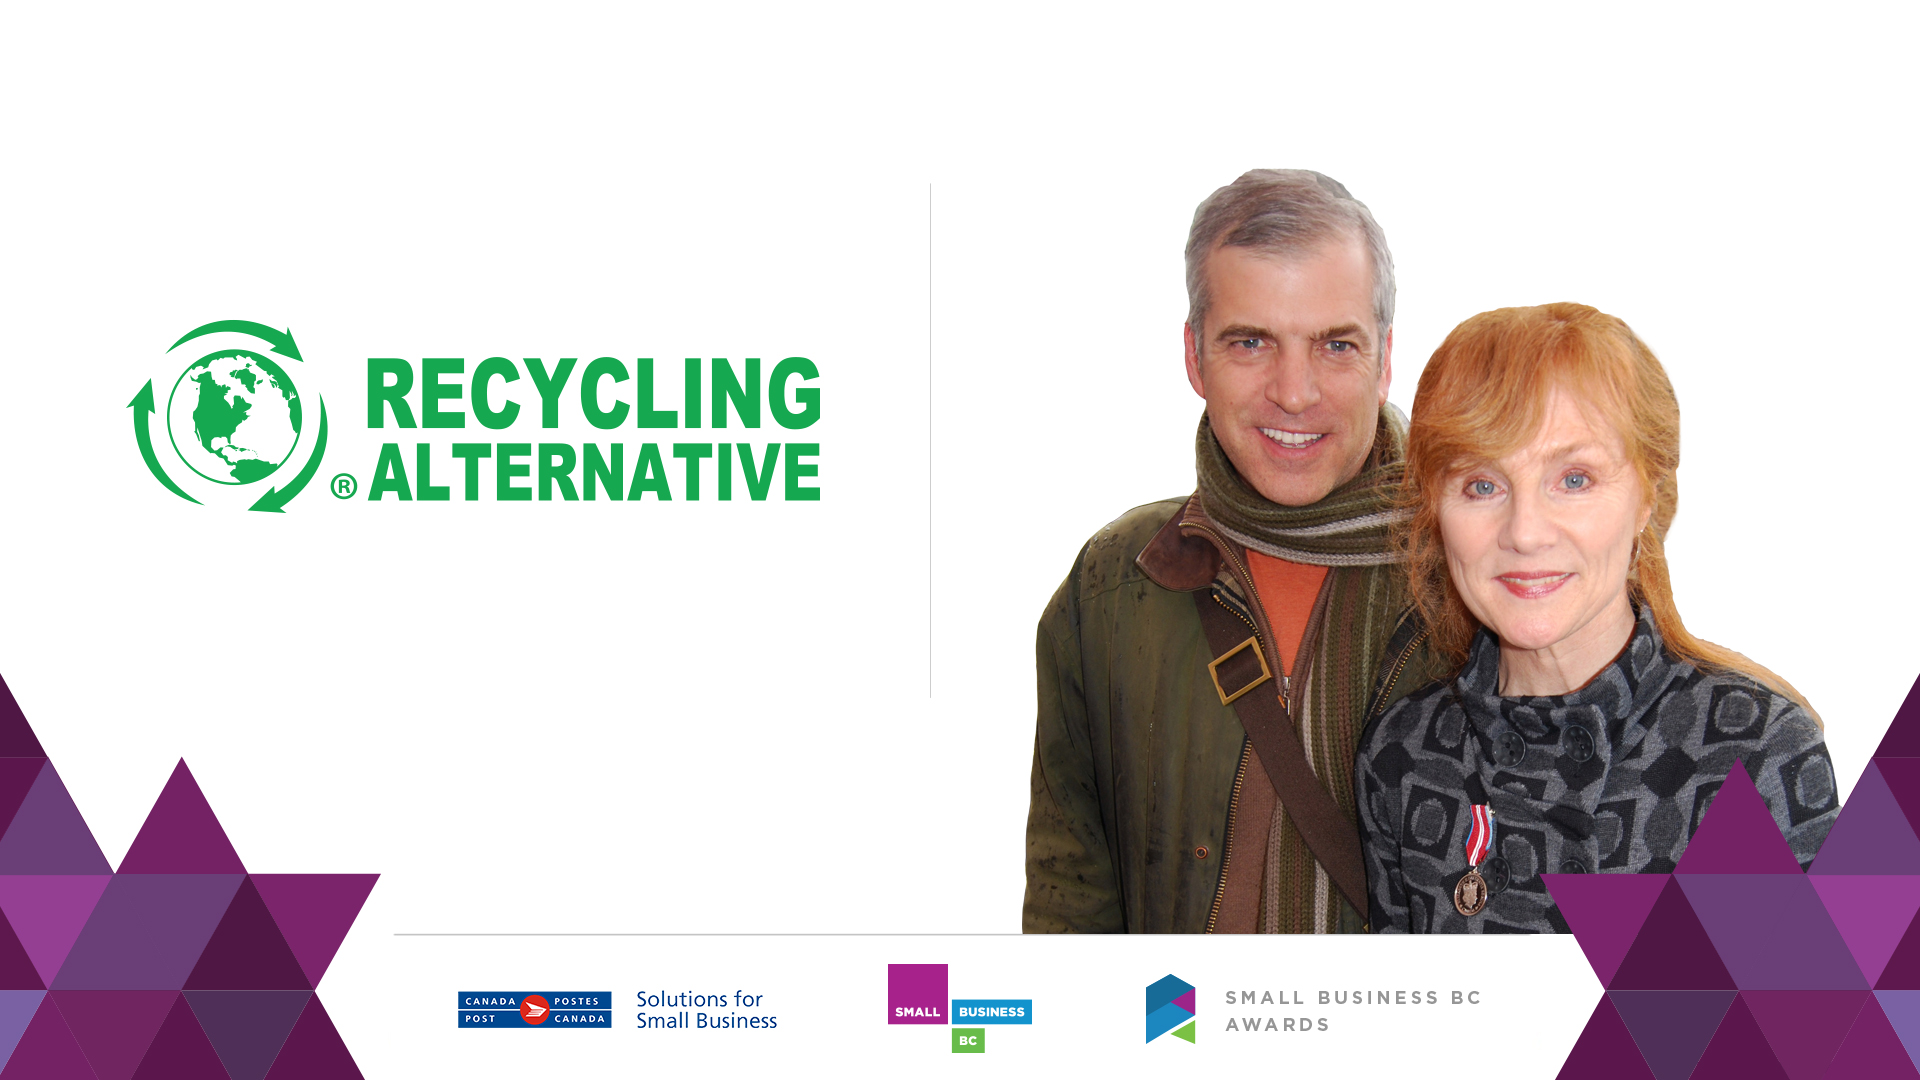 Recycling Alternative